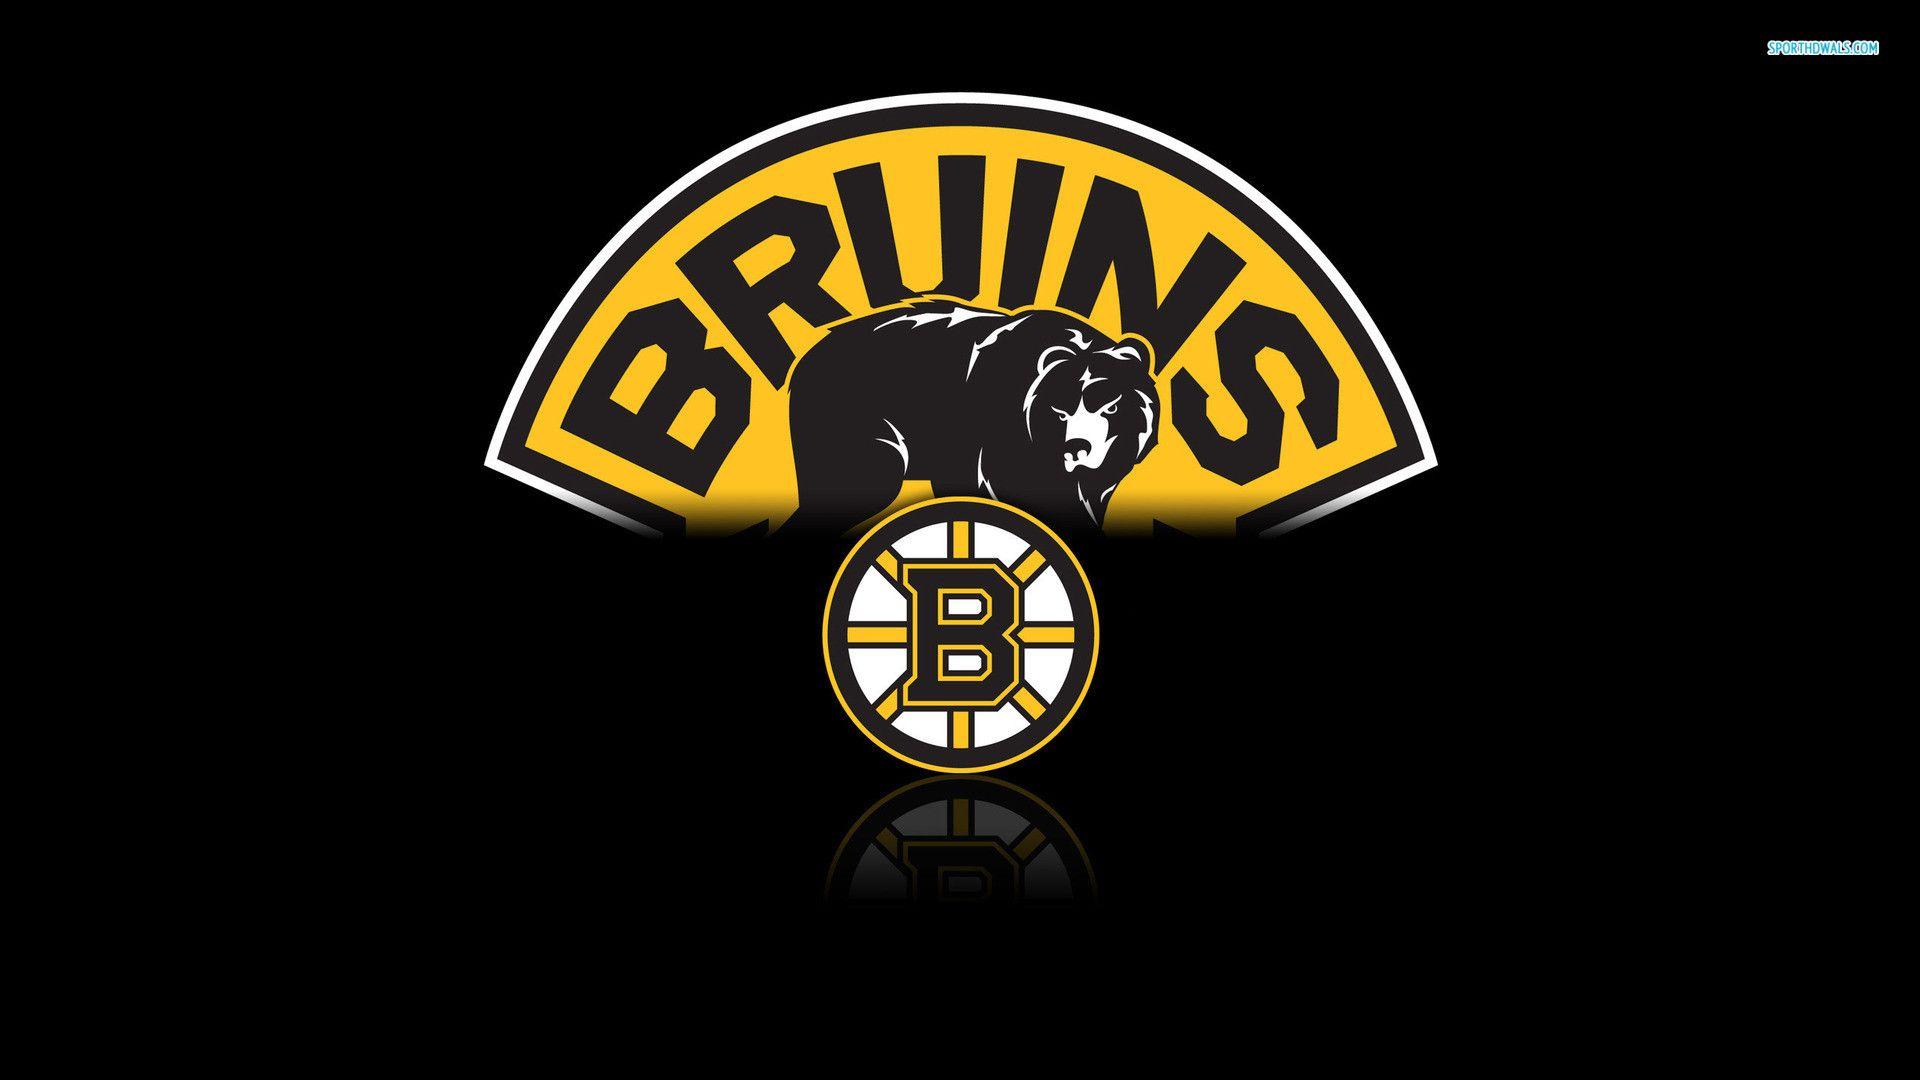 Boston Bruins Wallpapers wallpapers 2020 Check more at